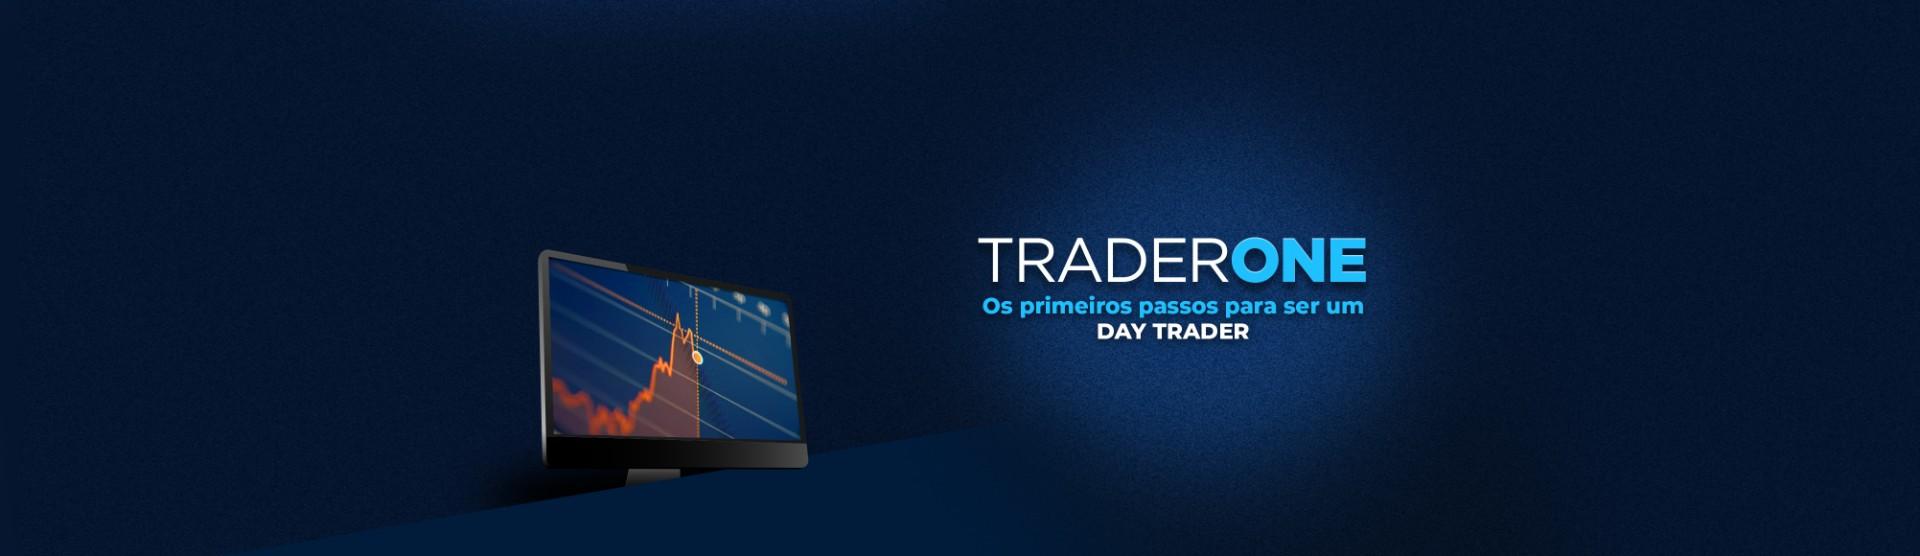 Traderone bg ead%20 1